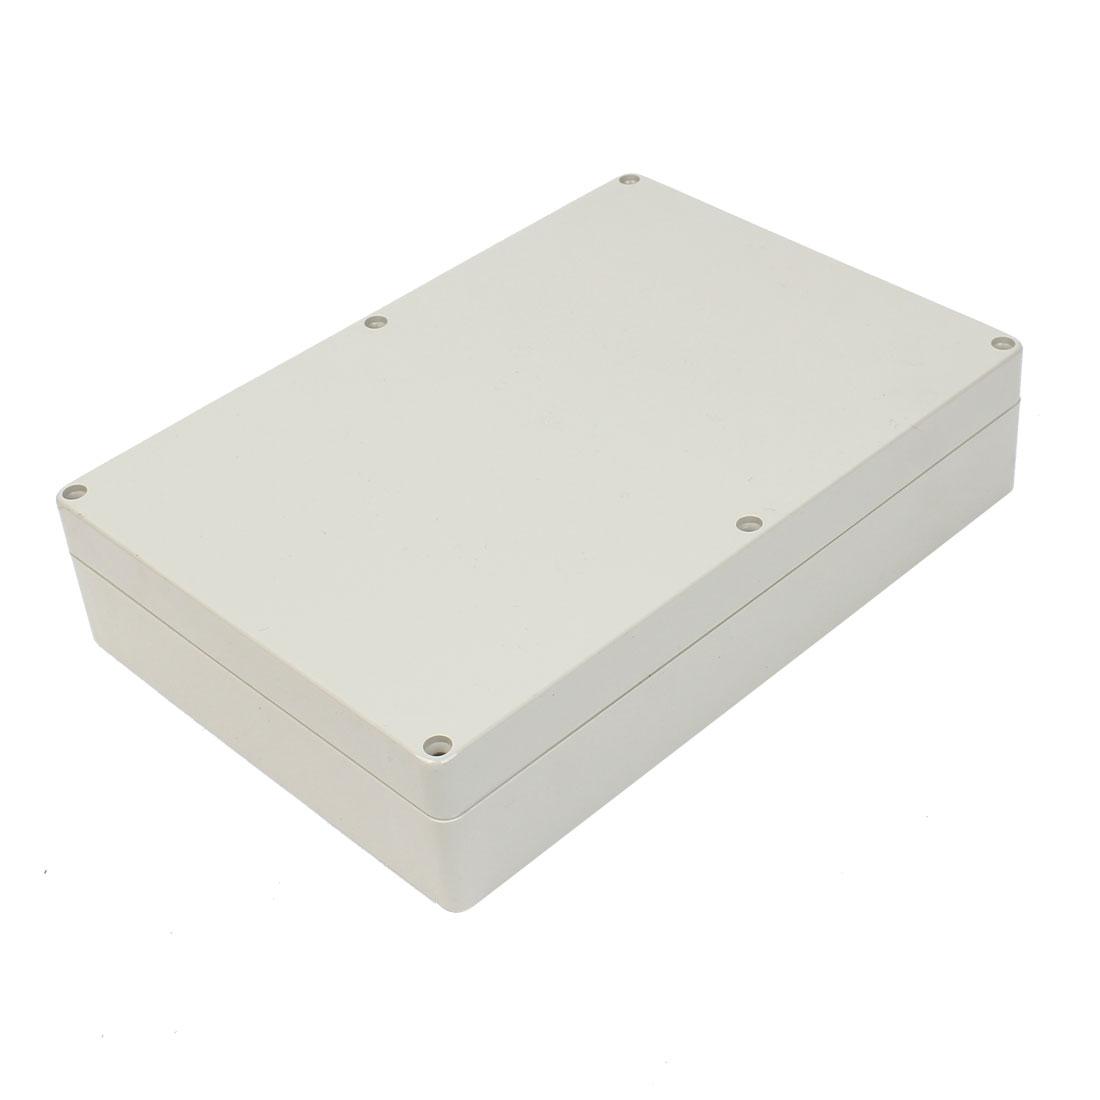 Rectangular Plastic DIY Junction Box Case 265 x 185 x 60mm